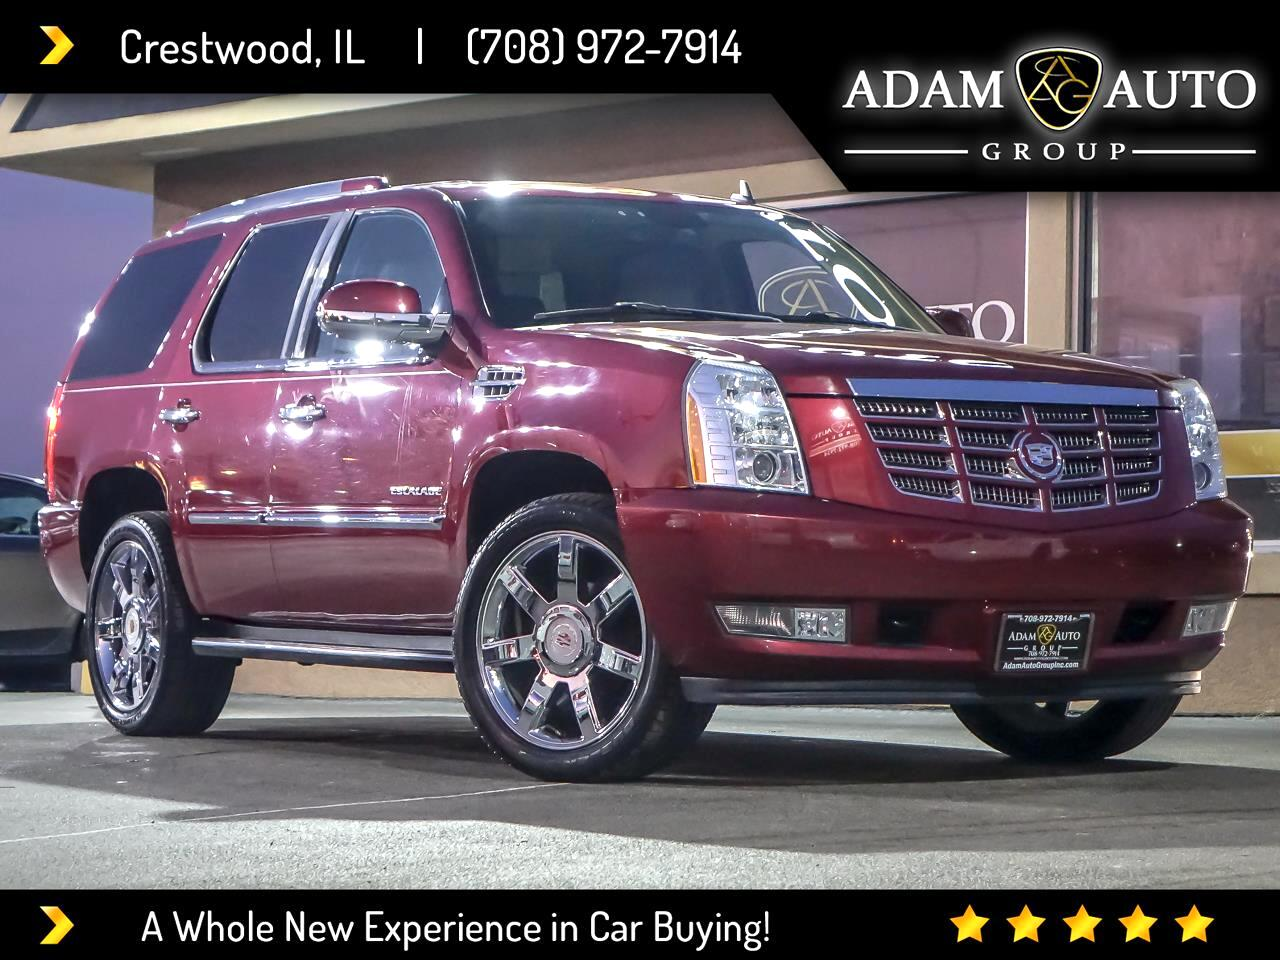 2010 Cadillac Escalade 4WD 4dr Premium